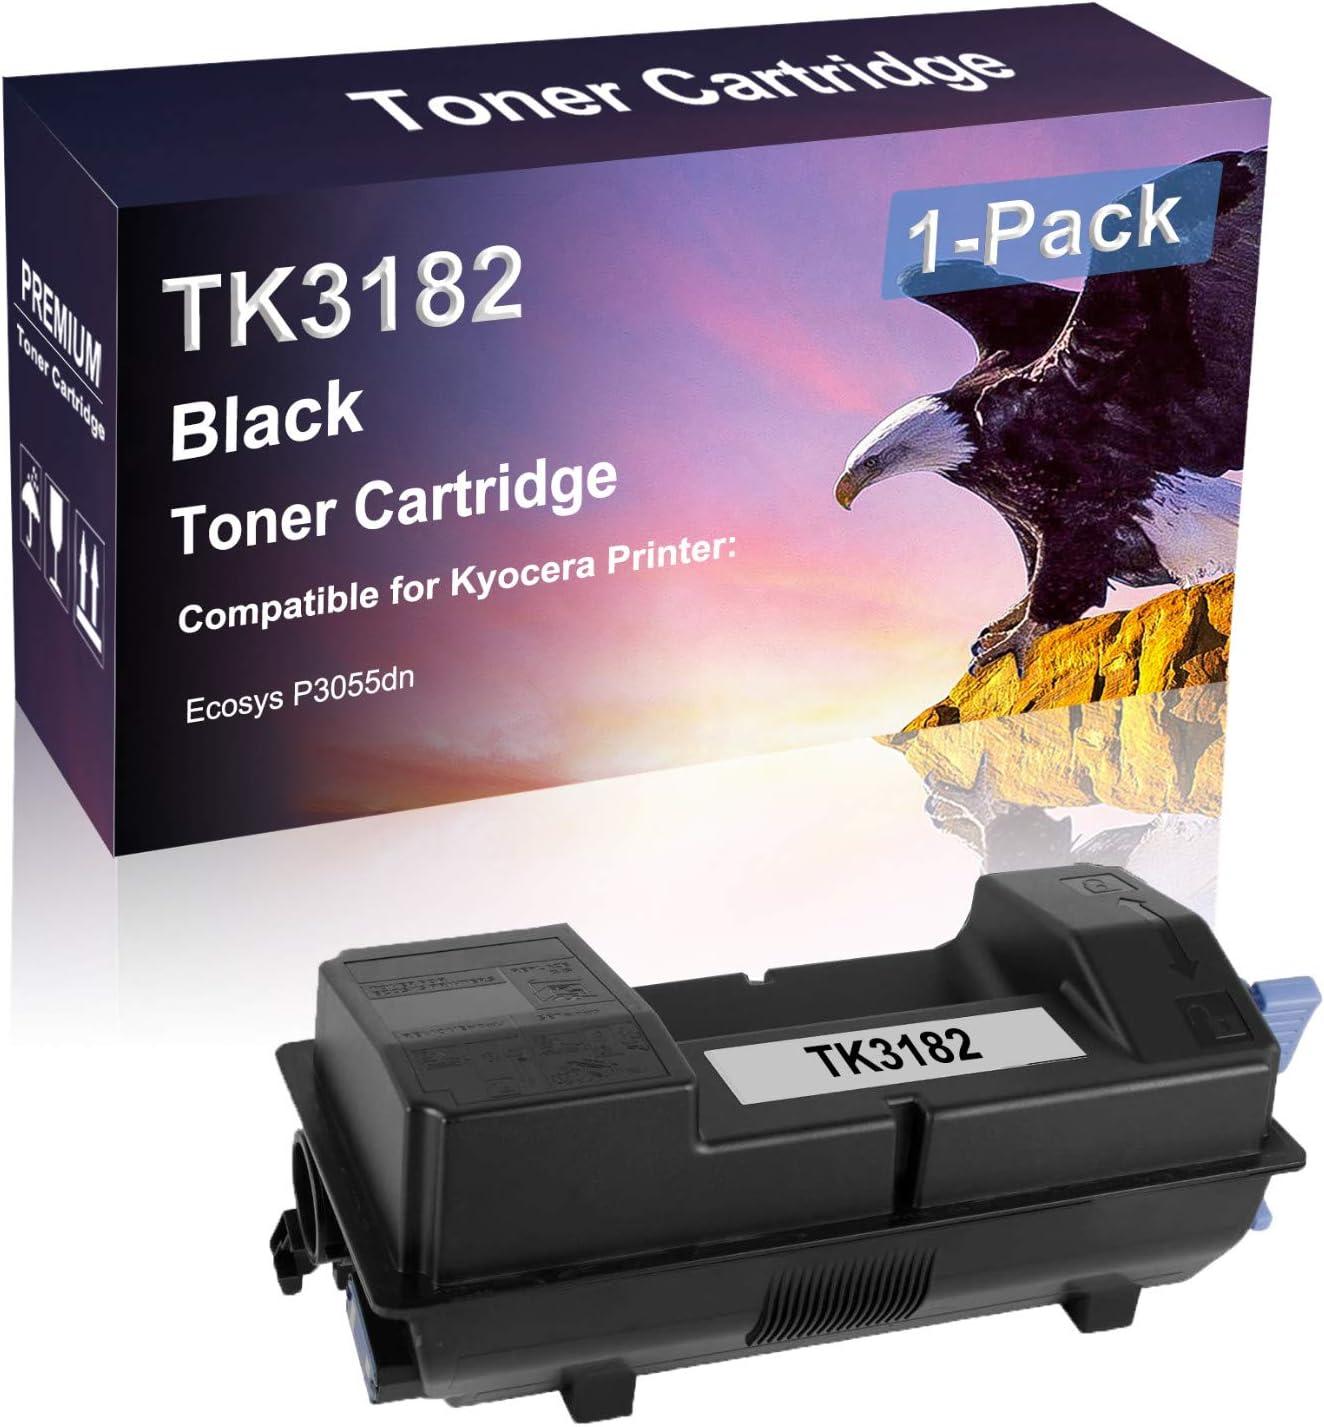 1 Pack Black Compatible High National uniform free shipping Toner Yield TK3182 Laser Max 80% OFF Printer